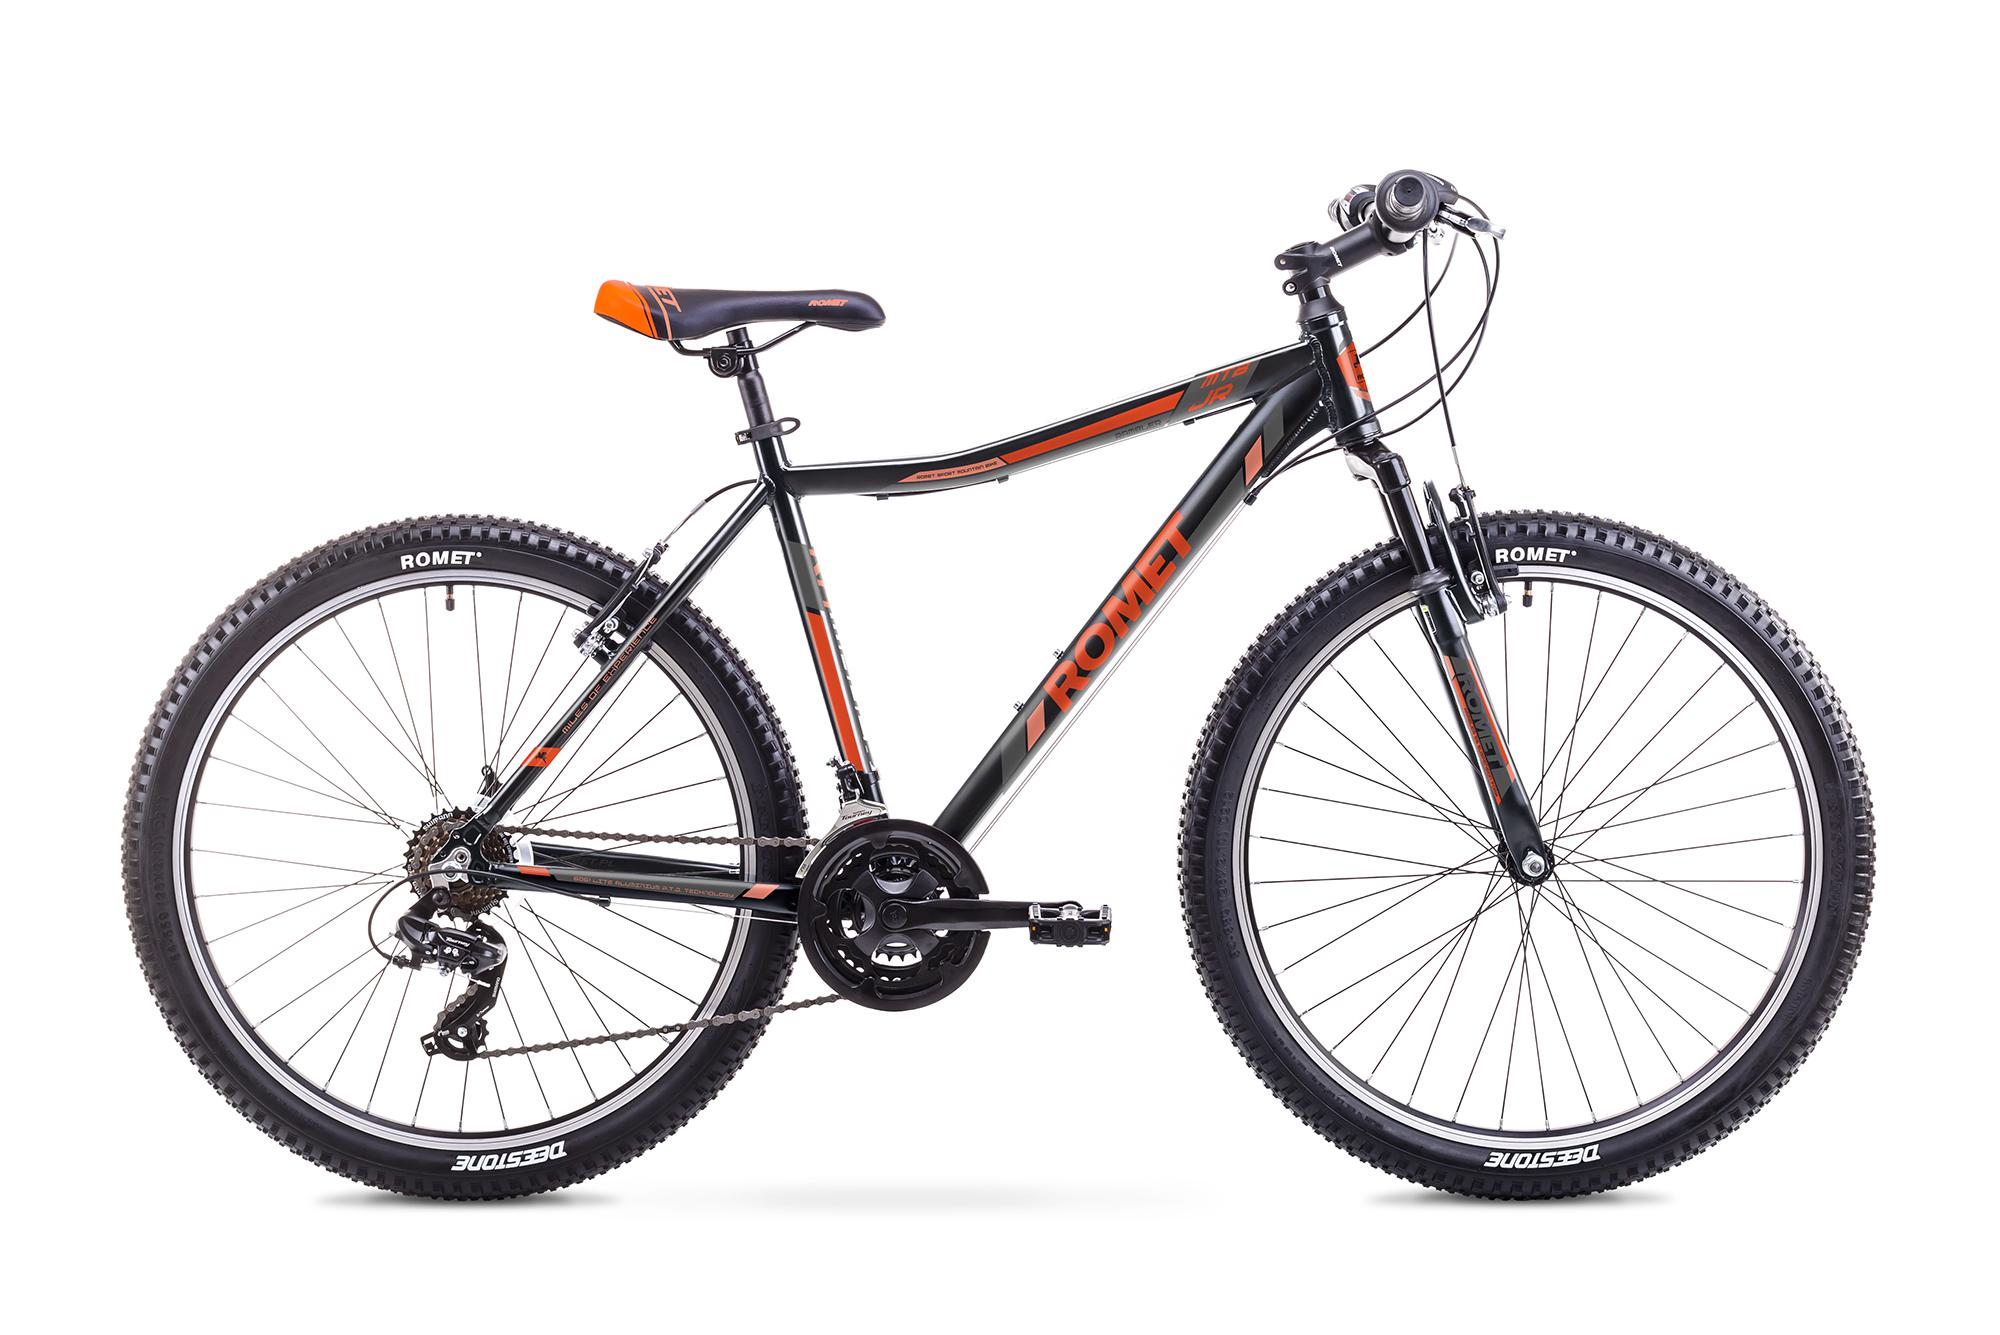 ROMET RAMBLER JR 26 (AR) 1726737-19L MEL/ORANŽŠ VELOSIPĒDS kalnu velosipēds MTB